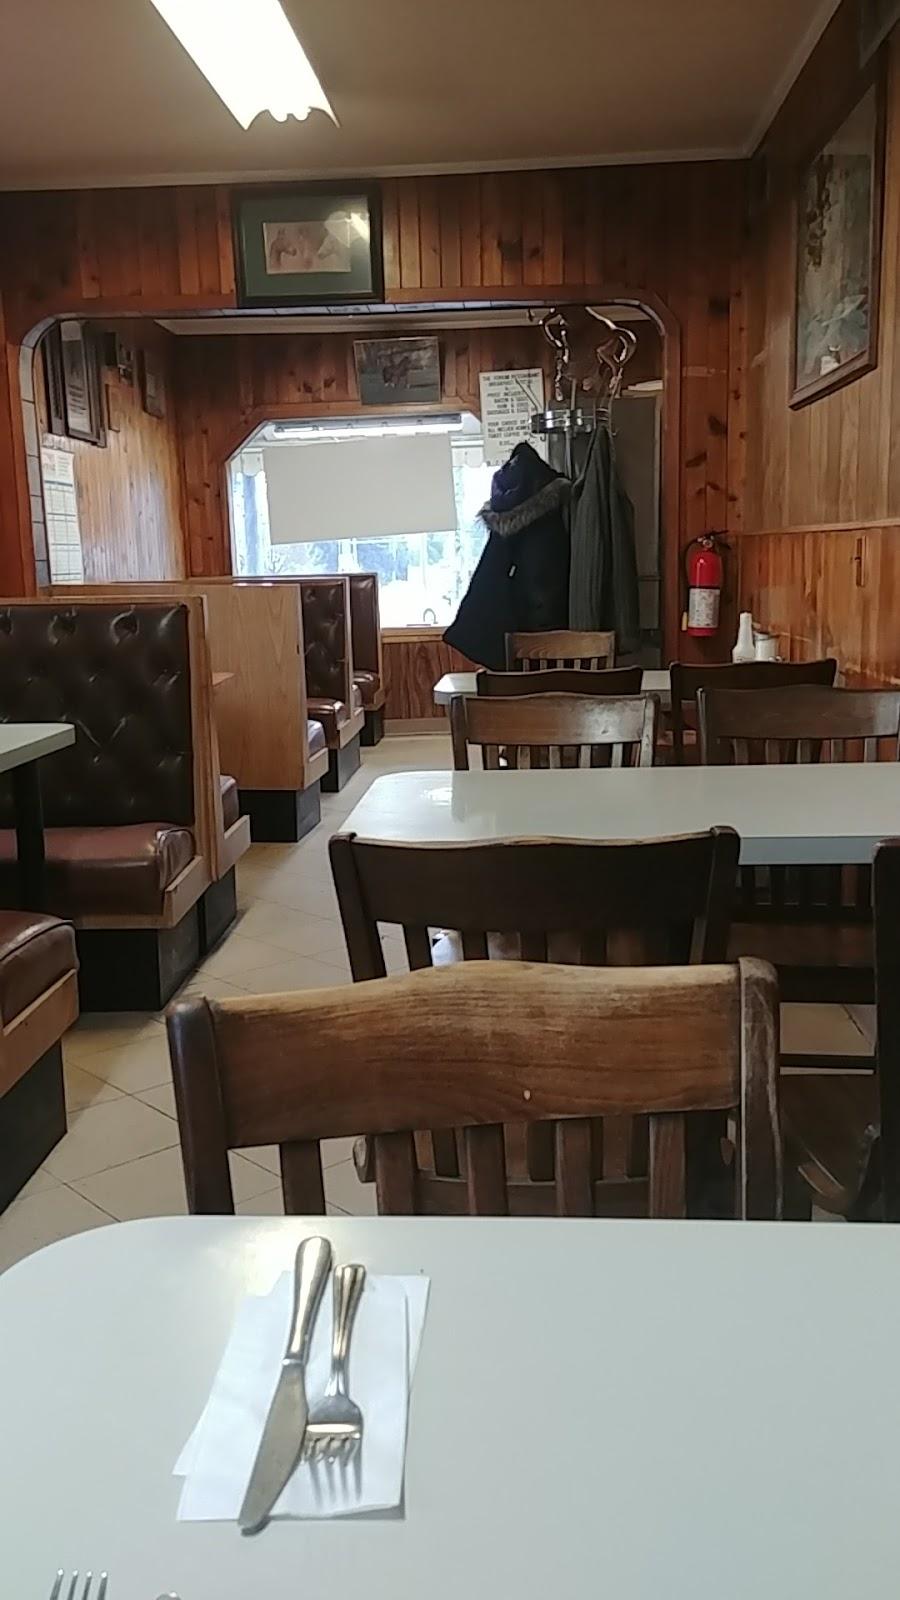 Forum Drive-In Restaurant | restaurant | 580 Ritson Rd S, Oshawa, ON L1H 5K8, Canada | 9057230682 OR +1 905-723-0682